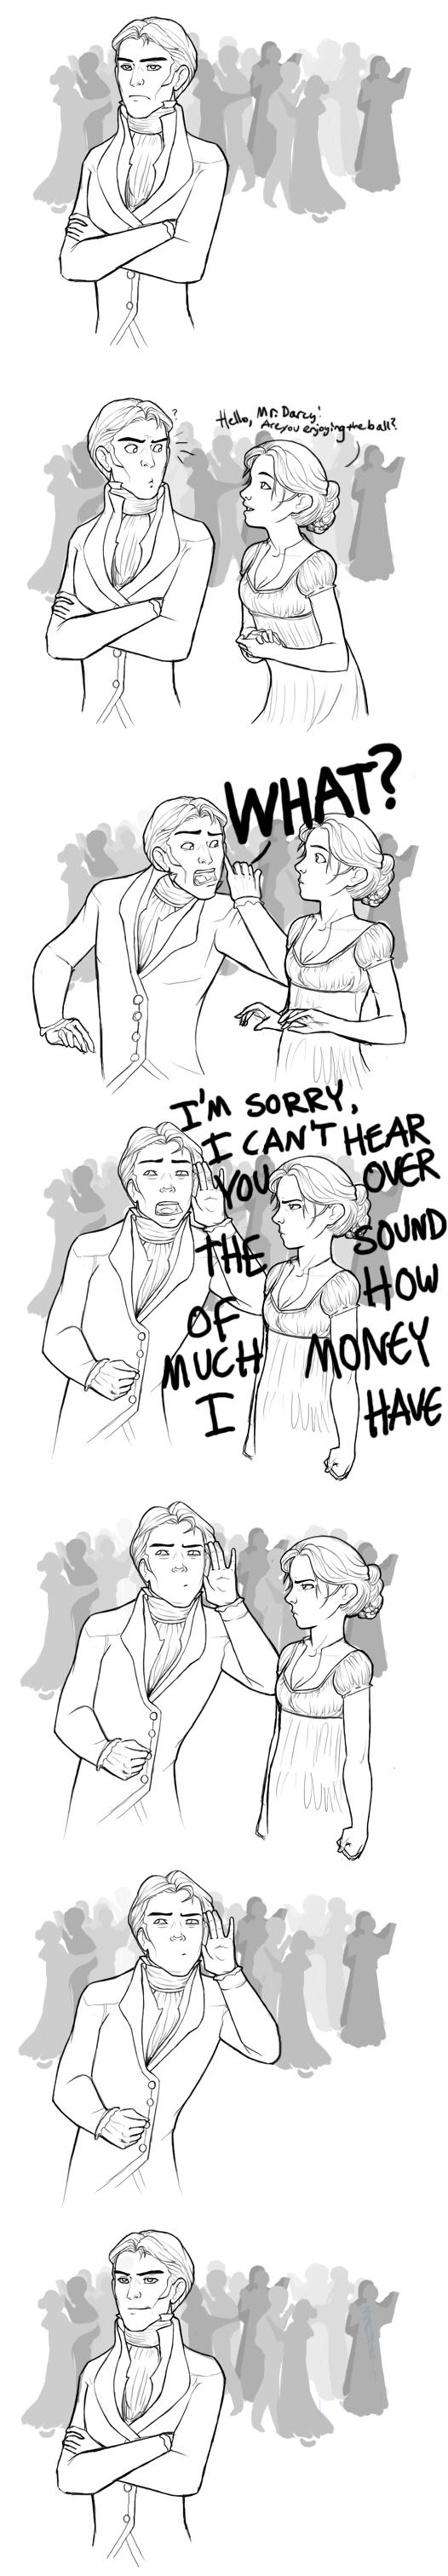 Pride and Prejudice- Mr. Darcy